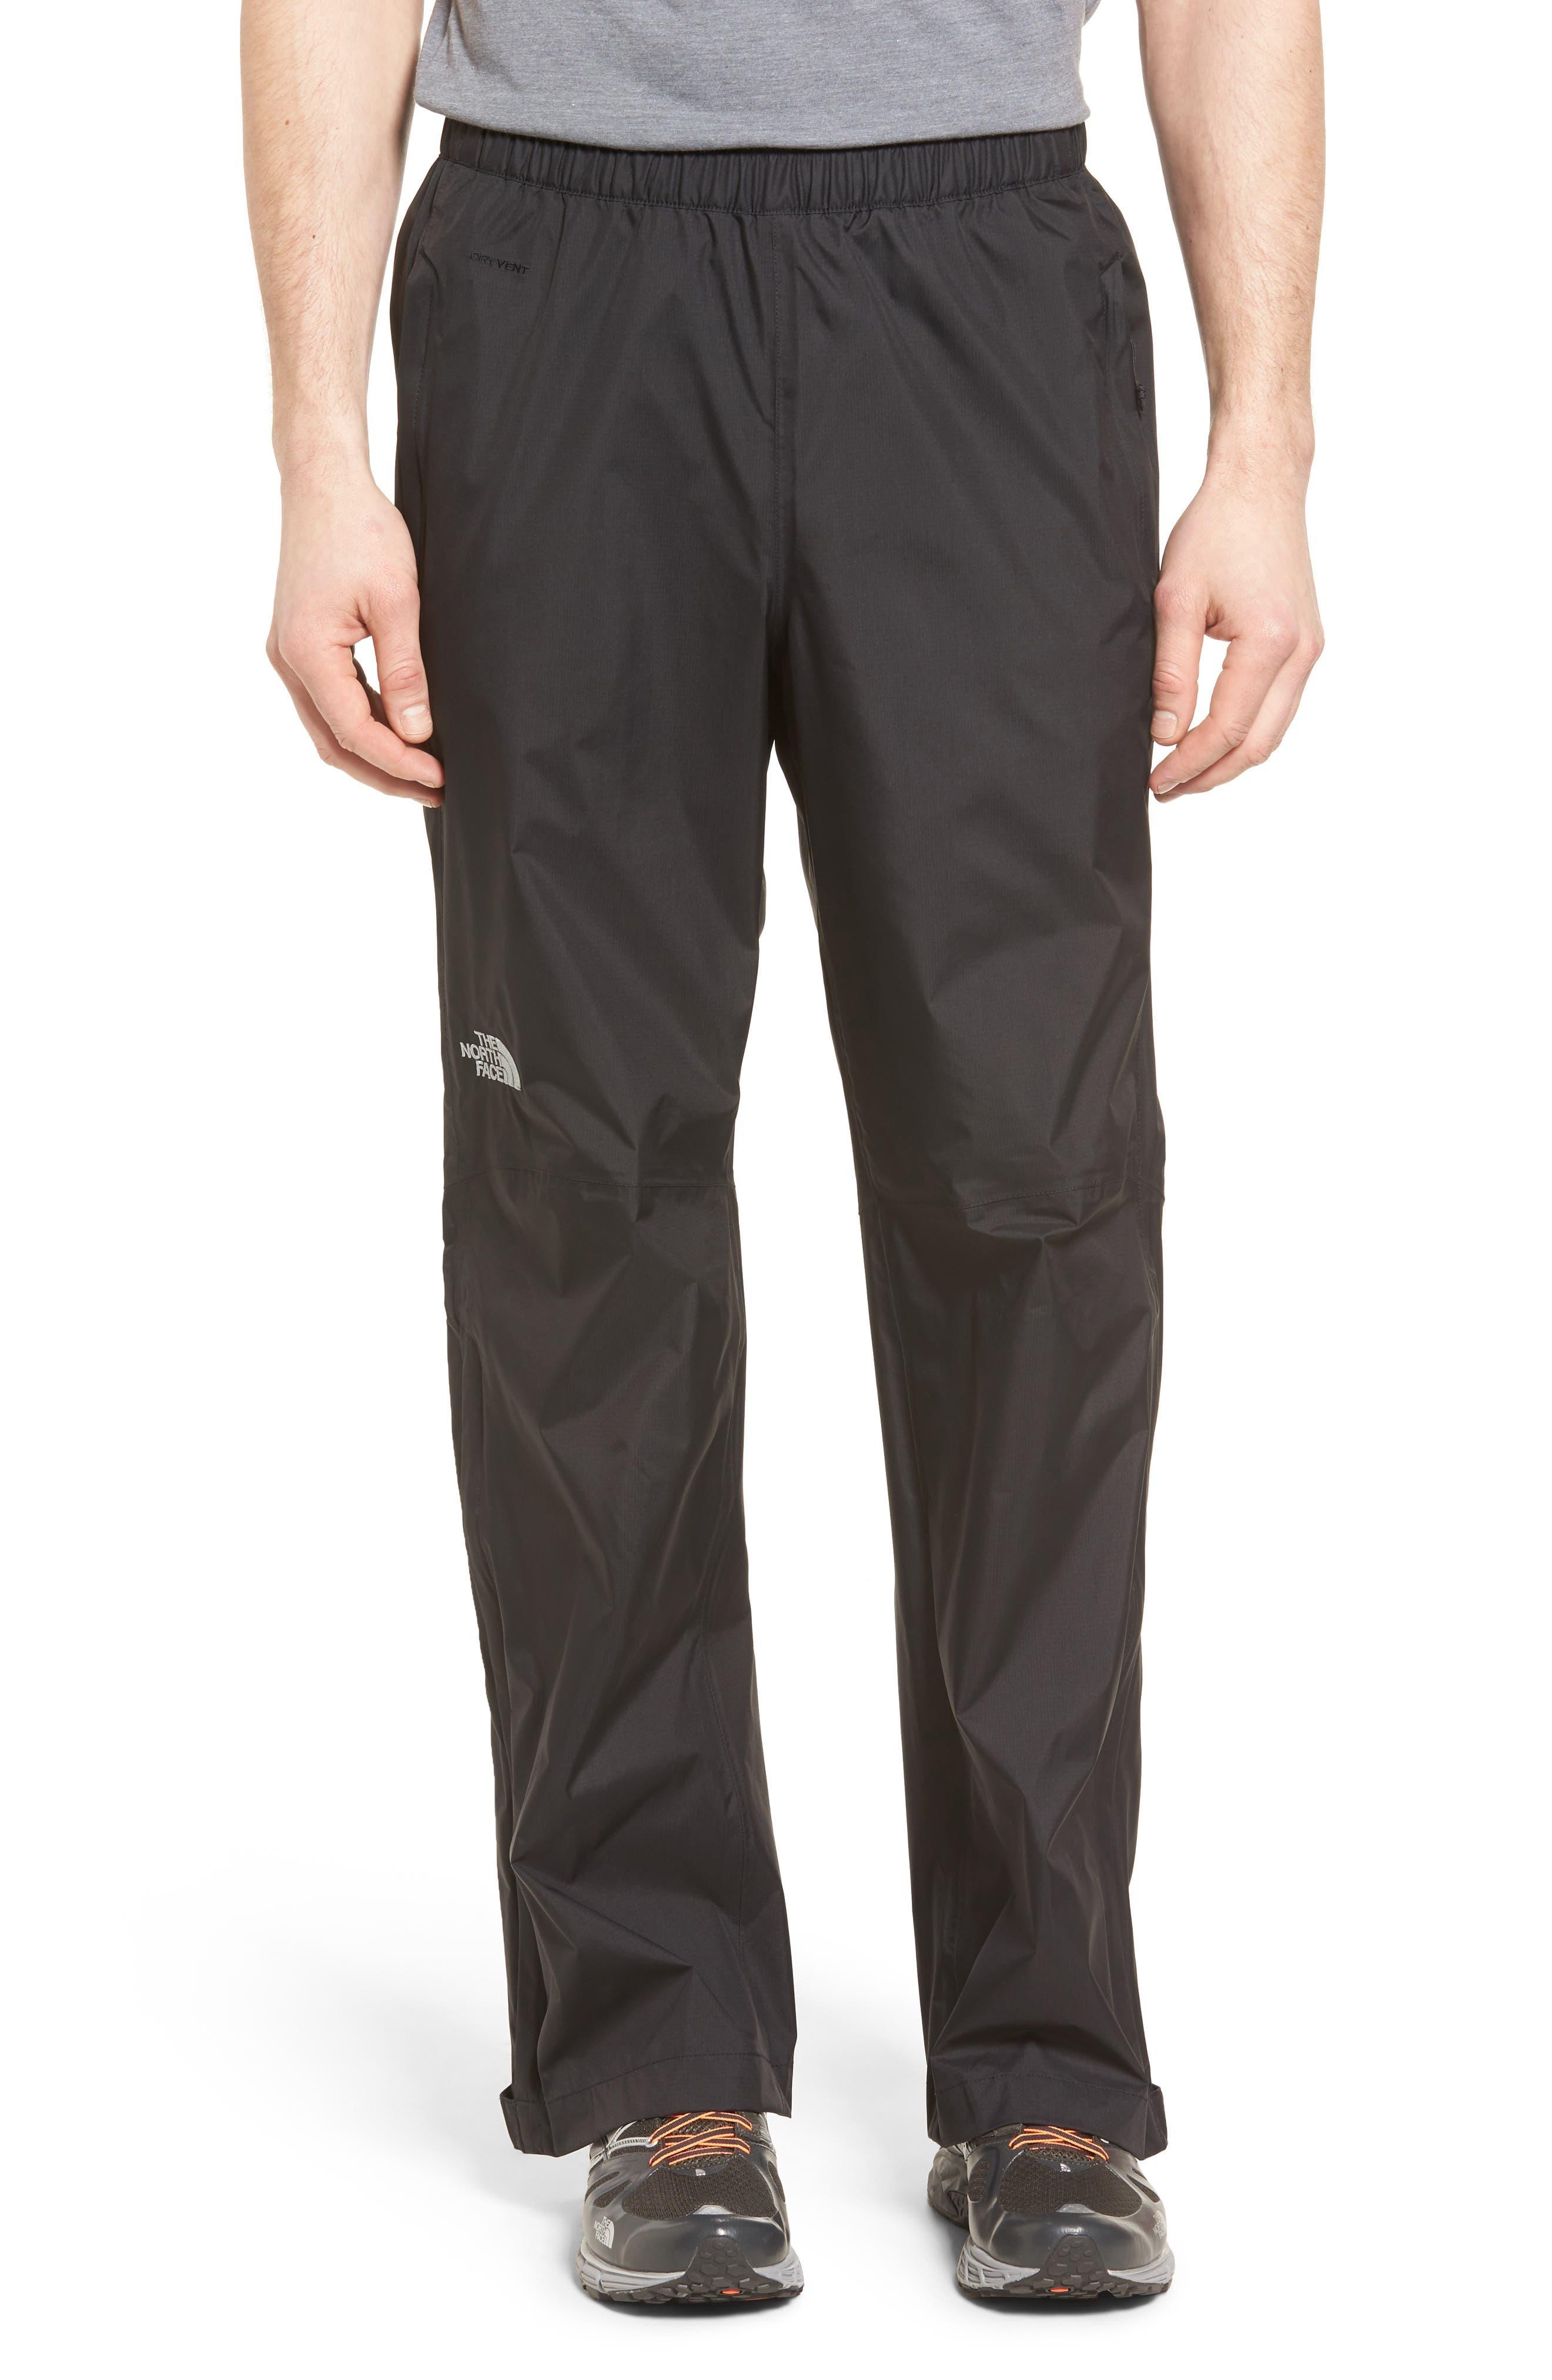 Venture Waterproof Pants,                         Main,                         color, 001